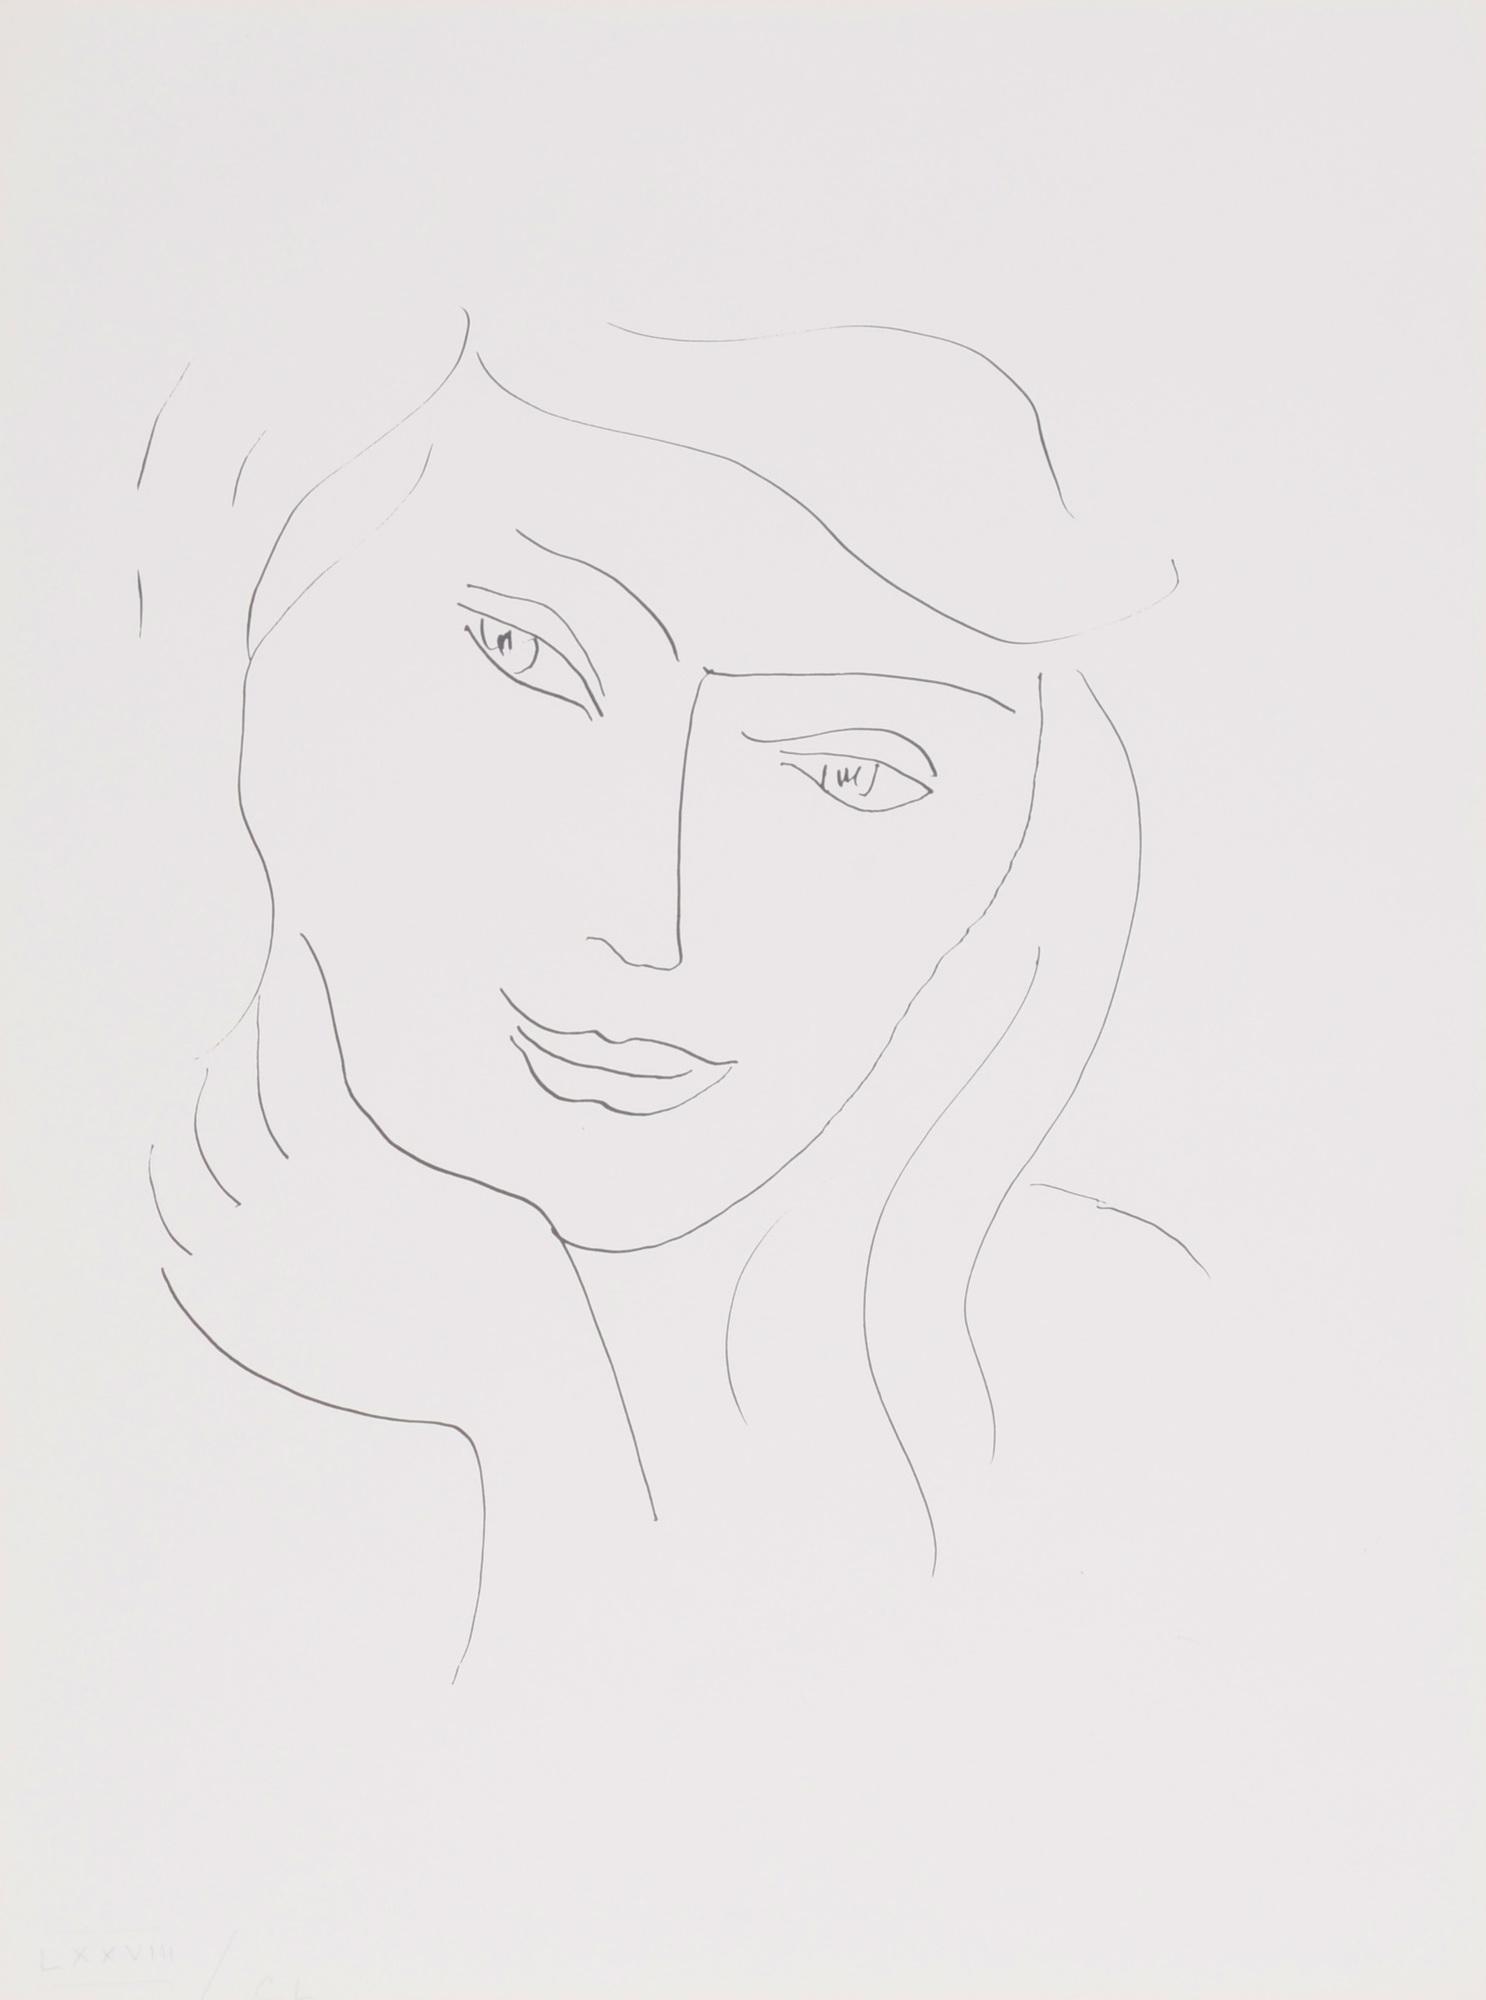 Grafik, 8 sheets: H. Matisse; J. Cocteau; P. Picasso (after); J. Cocteau; P. Bonnard; B. Salinas; S. Hasegawa; J.P. Cassigneul; G. Bardone